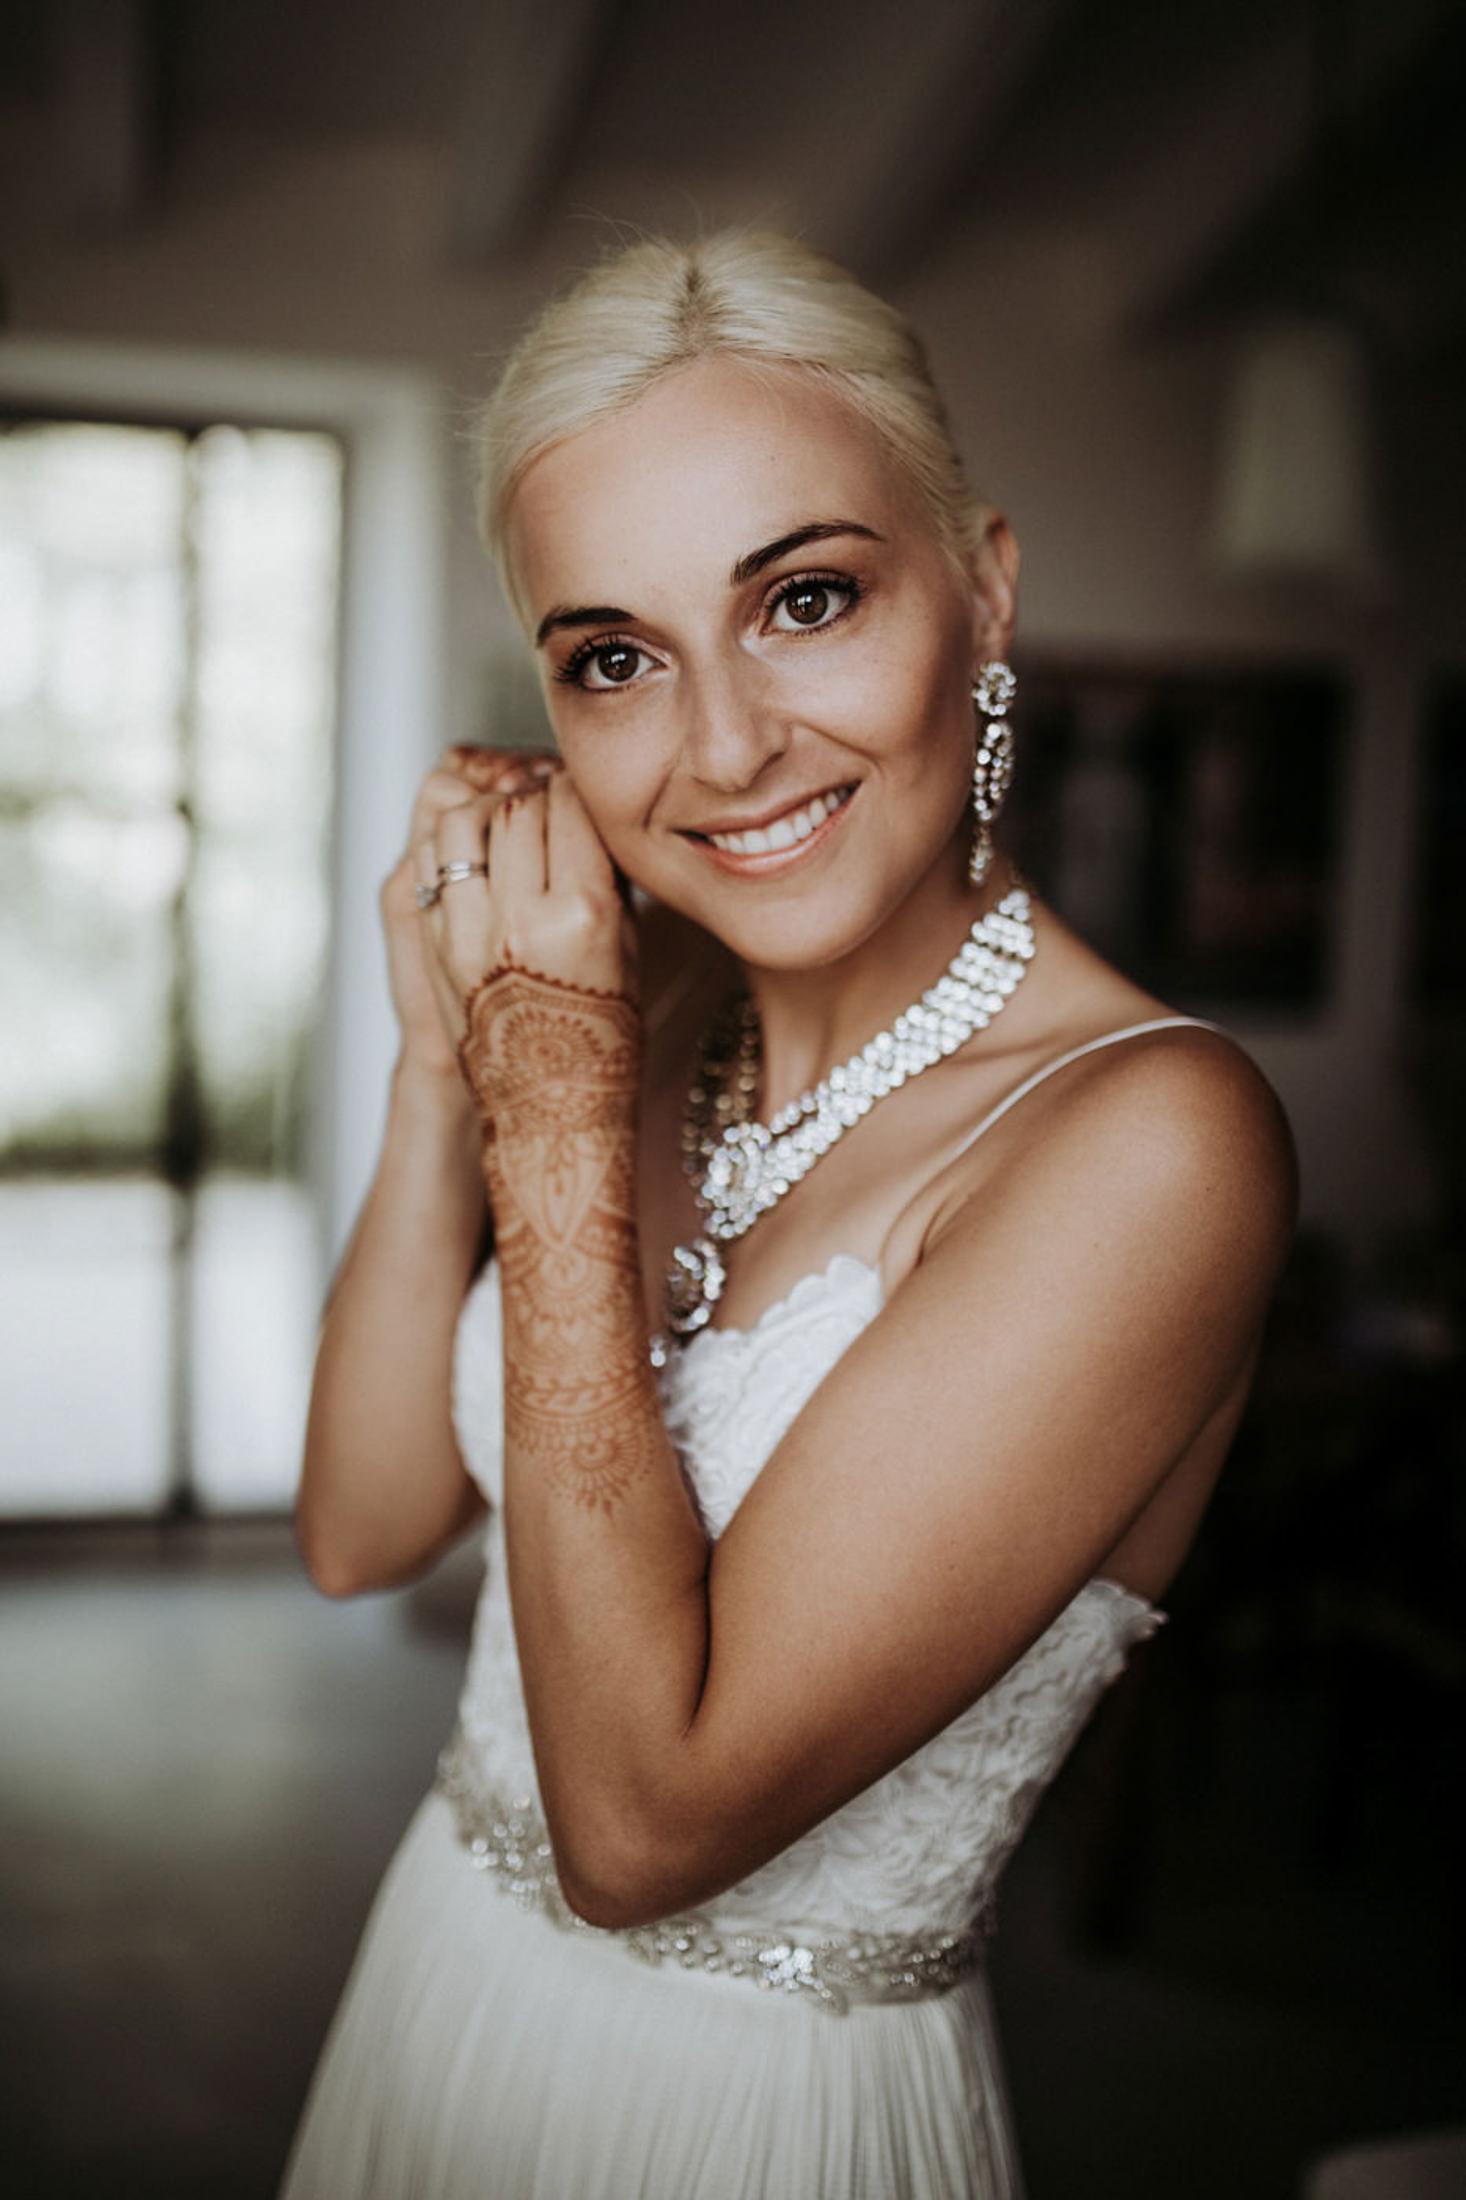 Wedding_Photographer_Mallorca_Daniela-Marquardt_Photography_New_York_Iceland_Tuscany_Santorini_Portugal_Austria_Bavaria_Elopement_Hochzeitsfotograf_AntjeRajat2_75